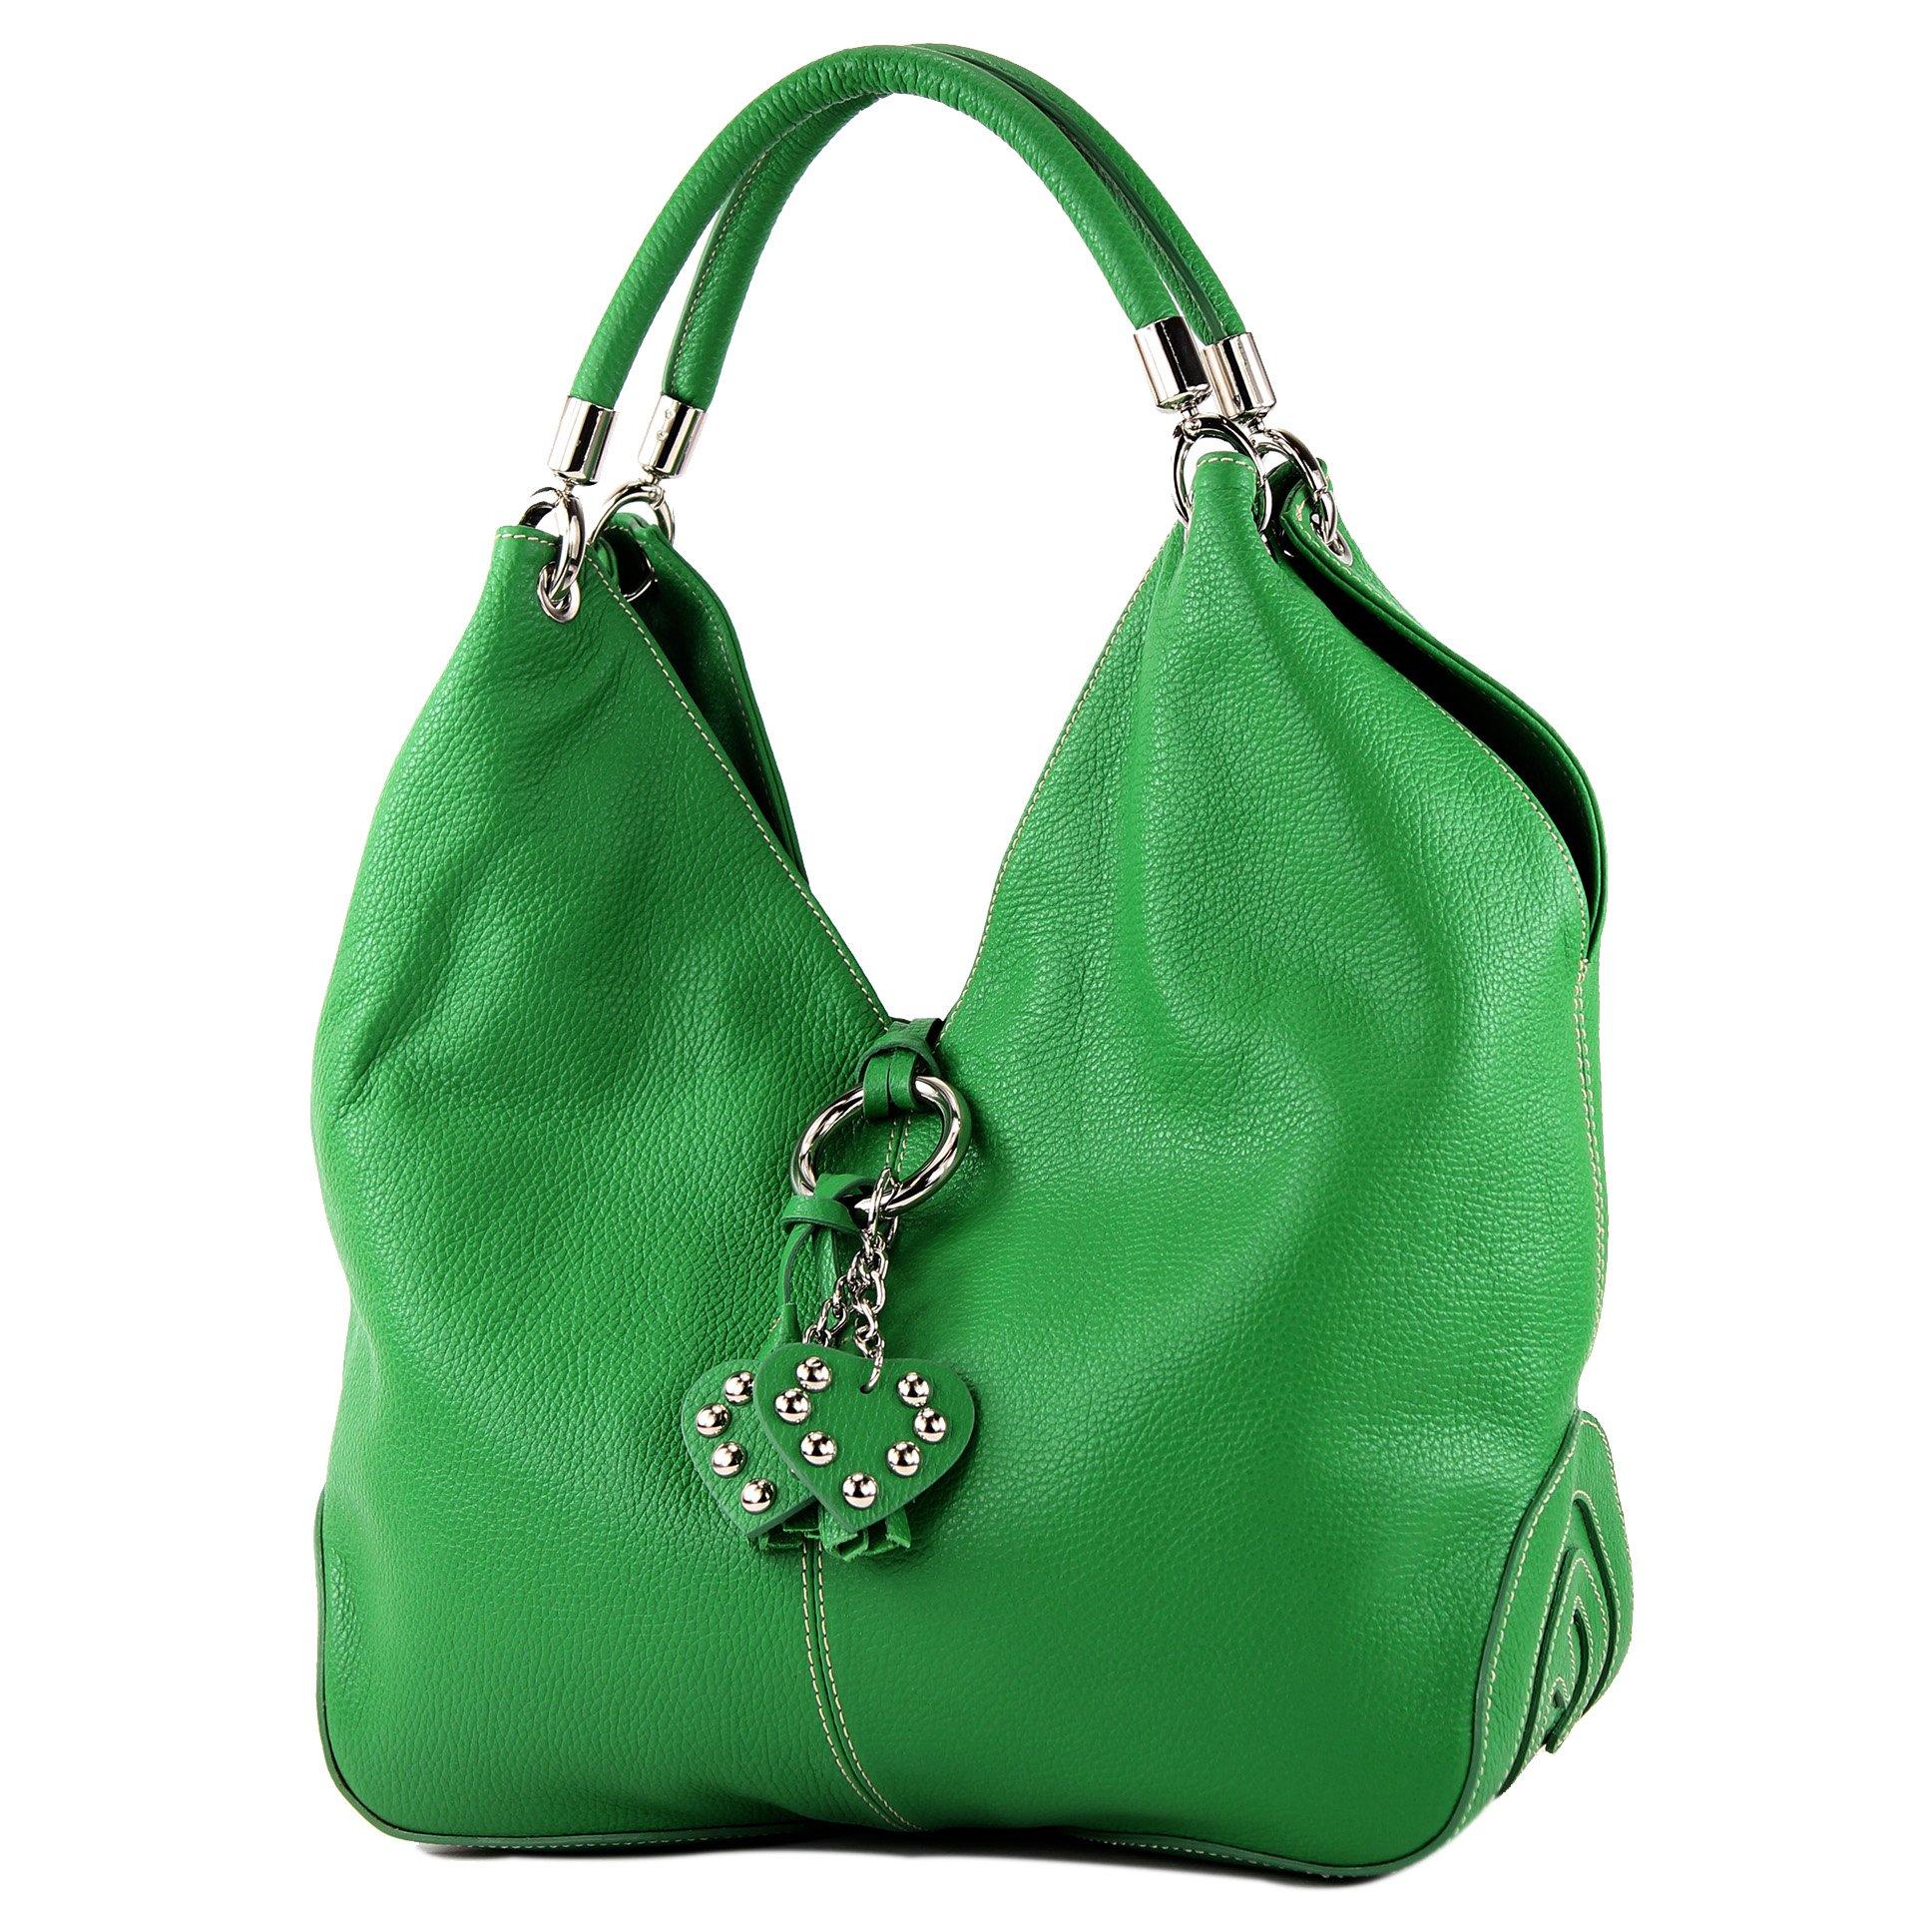 e47d0f74a34dd modamoda de - 330 - ital Handtasche Shopper Schultertasche Leder product  image